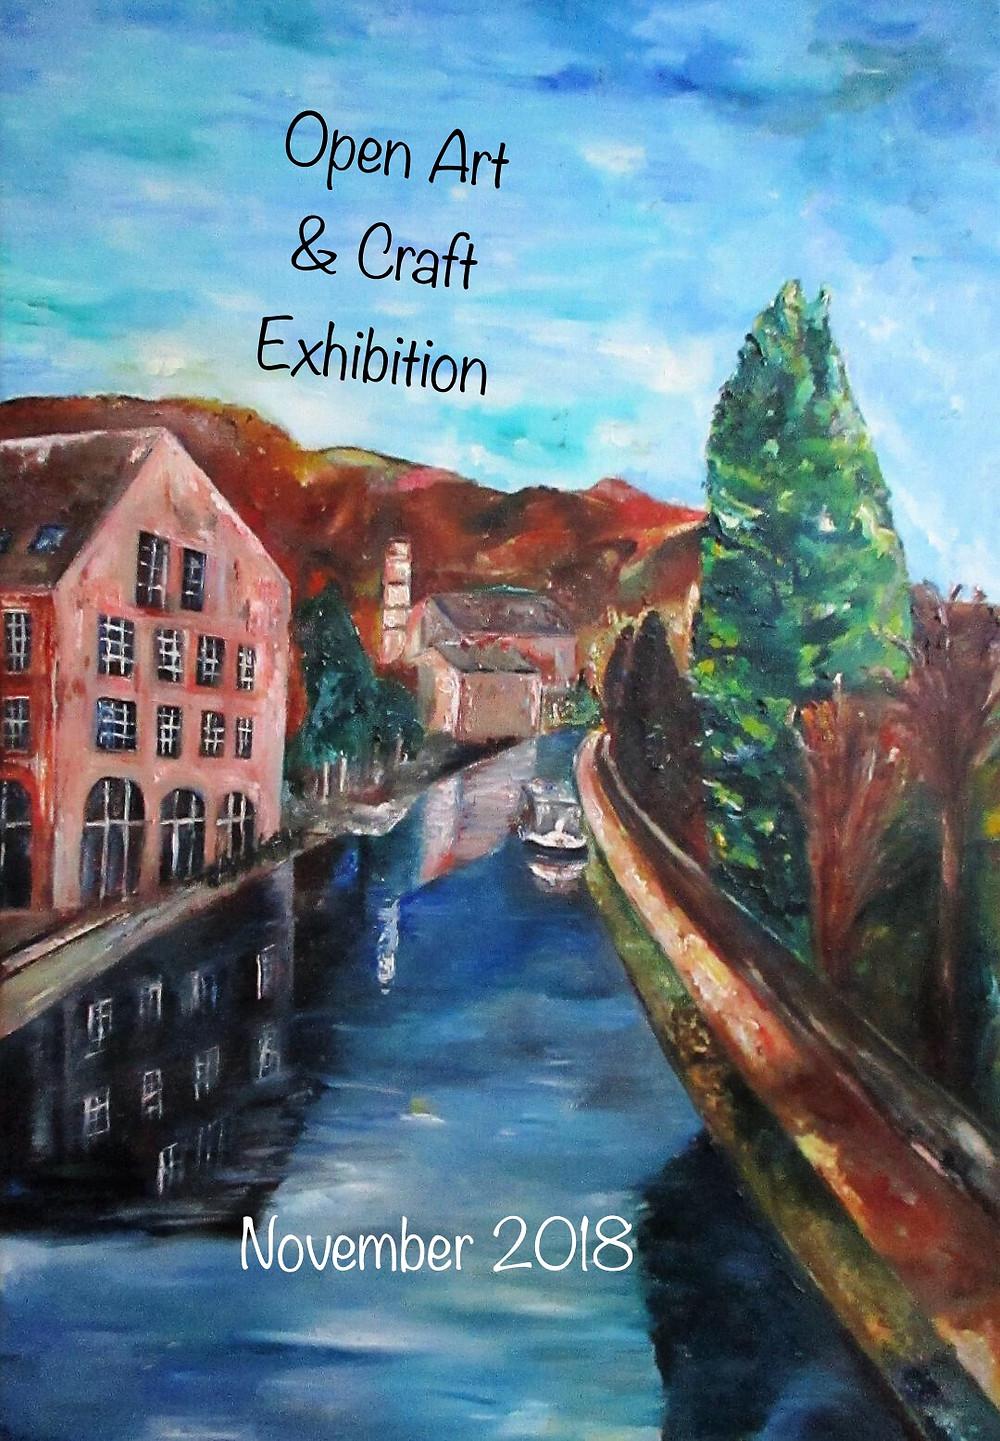 Open Art & Craft Exhibition